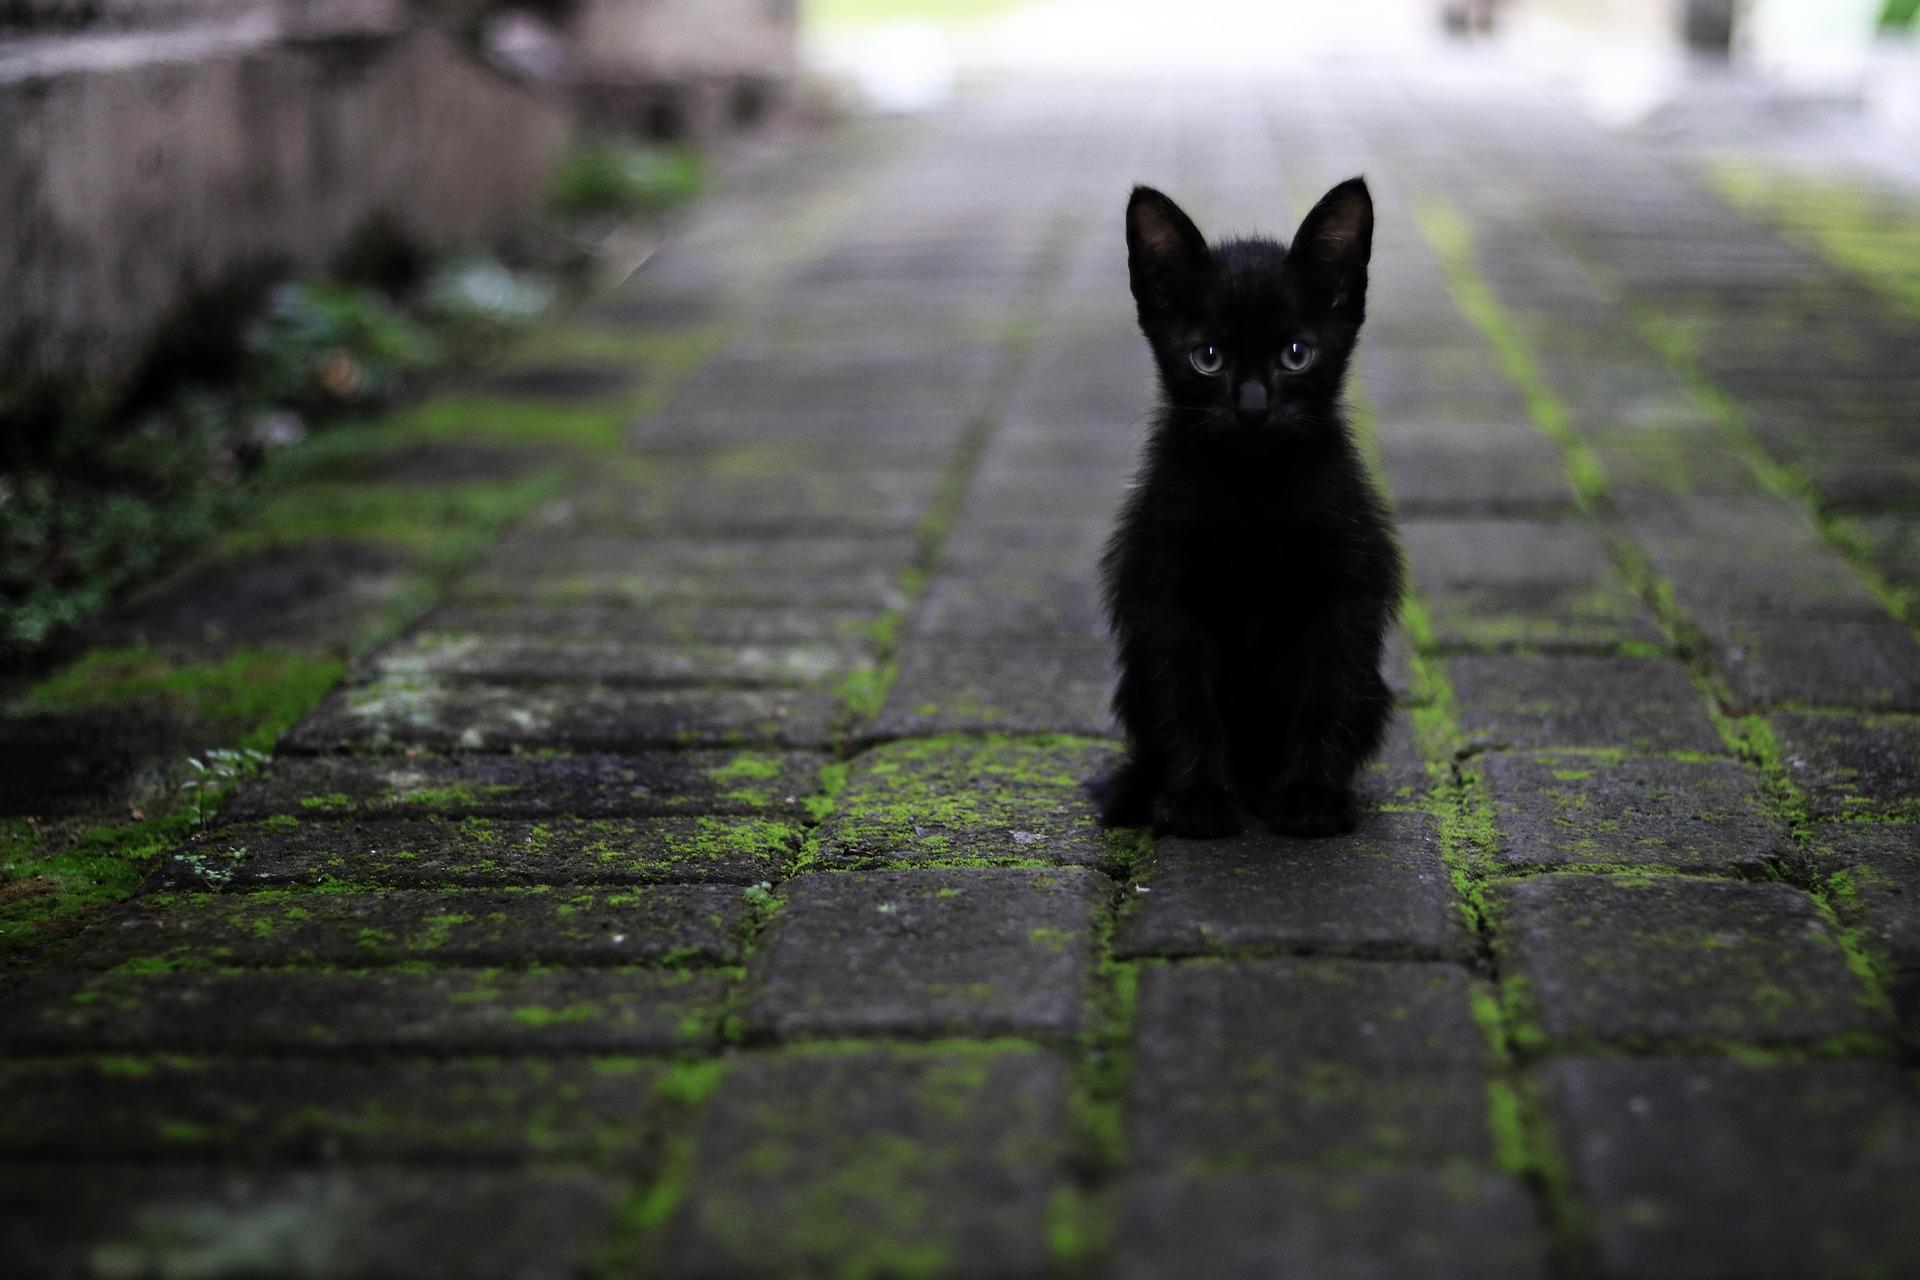 Gatti neri rapiti dai satanisti, l'allarme AIDAA